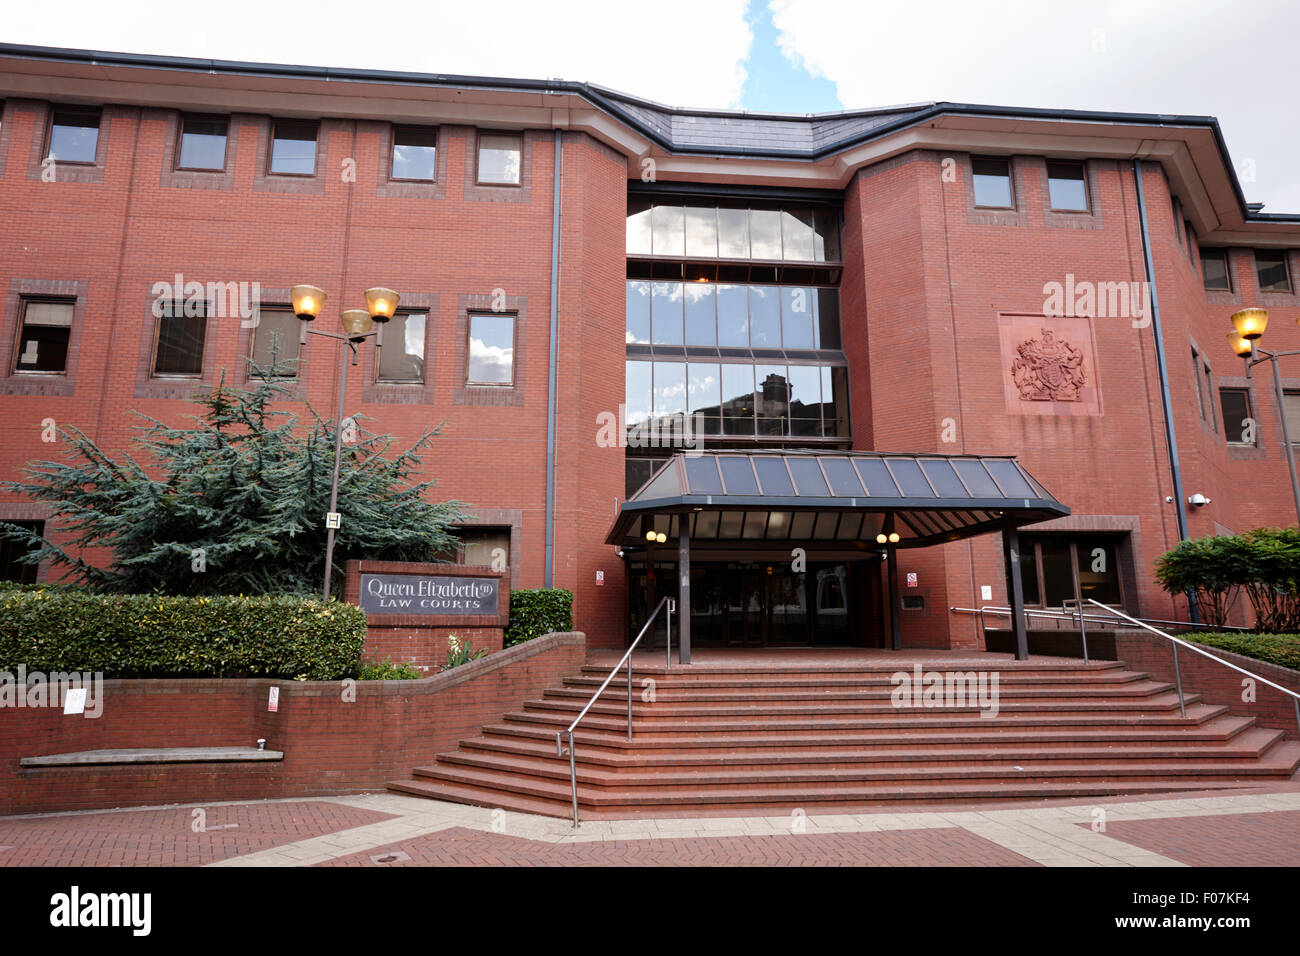 Queen Elizabeth 2 Law Courts Site Of Birmingham Crown Court Uk Stock Photo Alamy